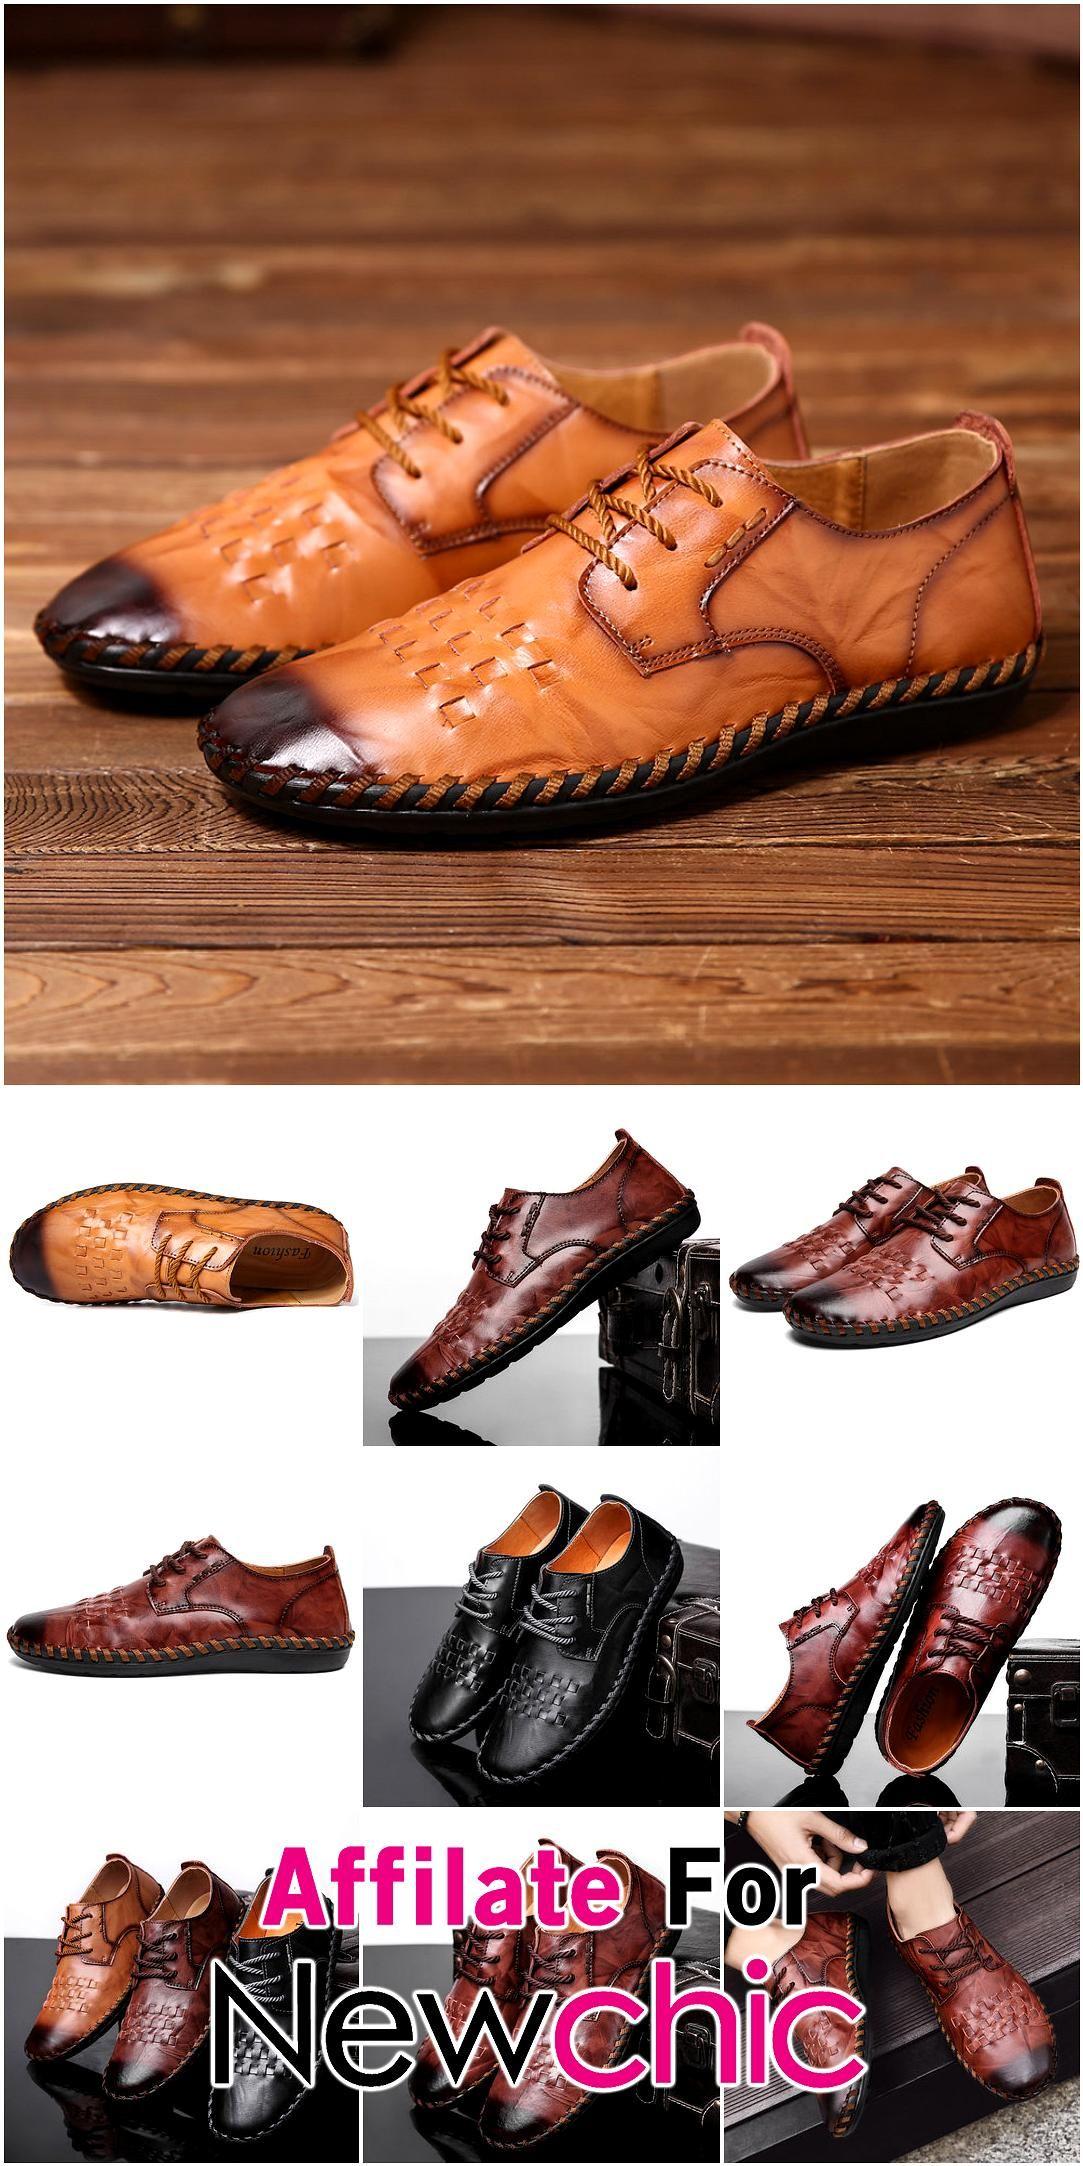 Menico Men Hand Stitching Woven Style Non Slip Soft Sole Leather Shoes USD 4615 Menico Men Hand Stitching Woven Style Non Slip Soft Sole Leather Shoes USD 4615 USD 923 50...